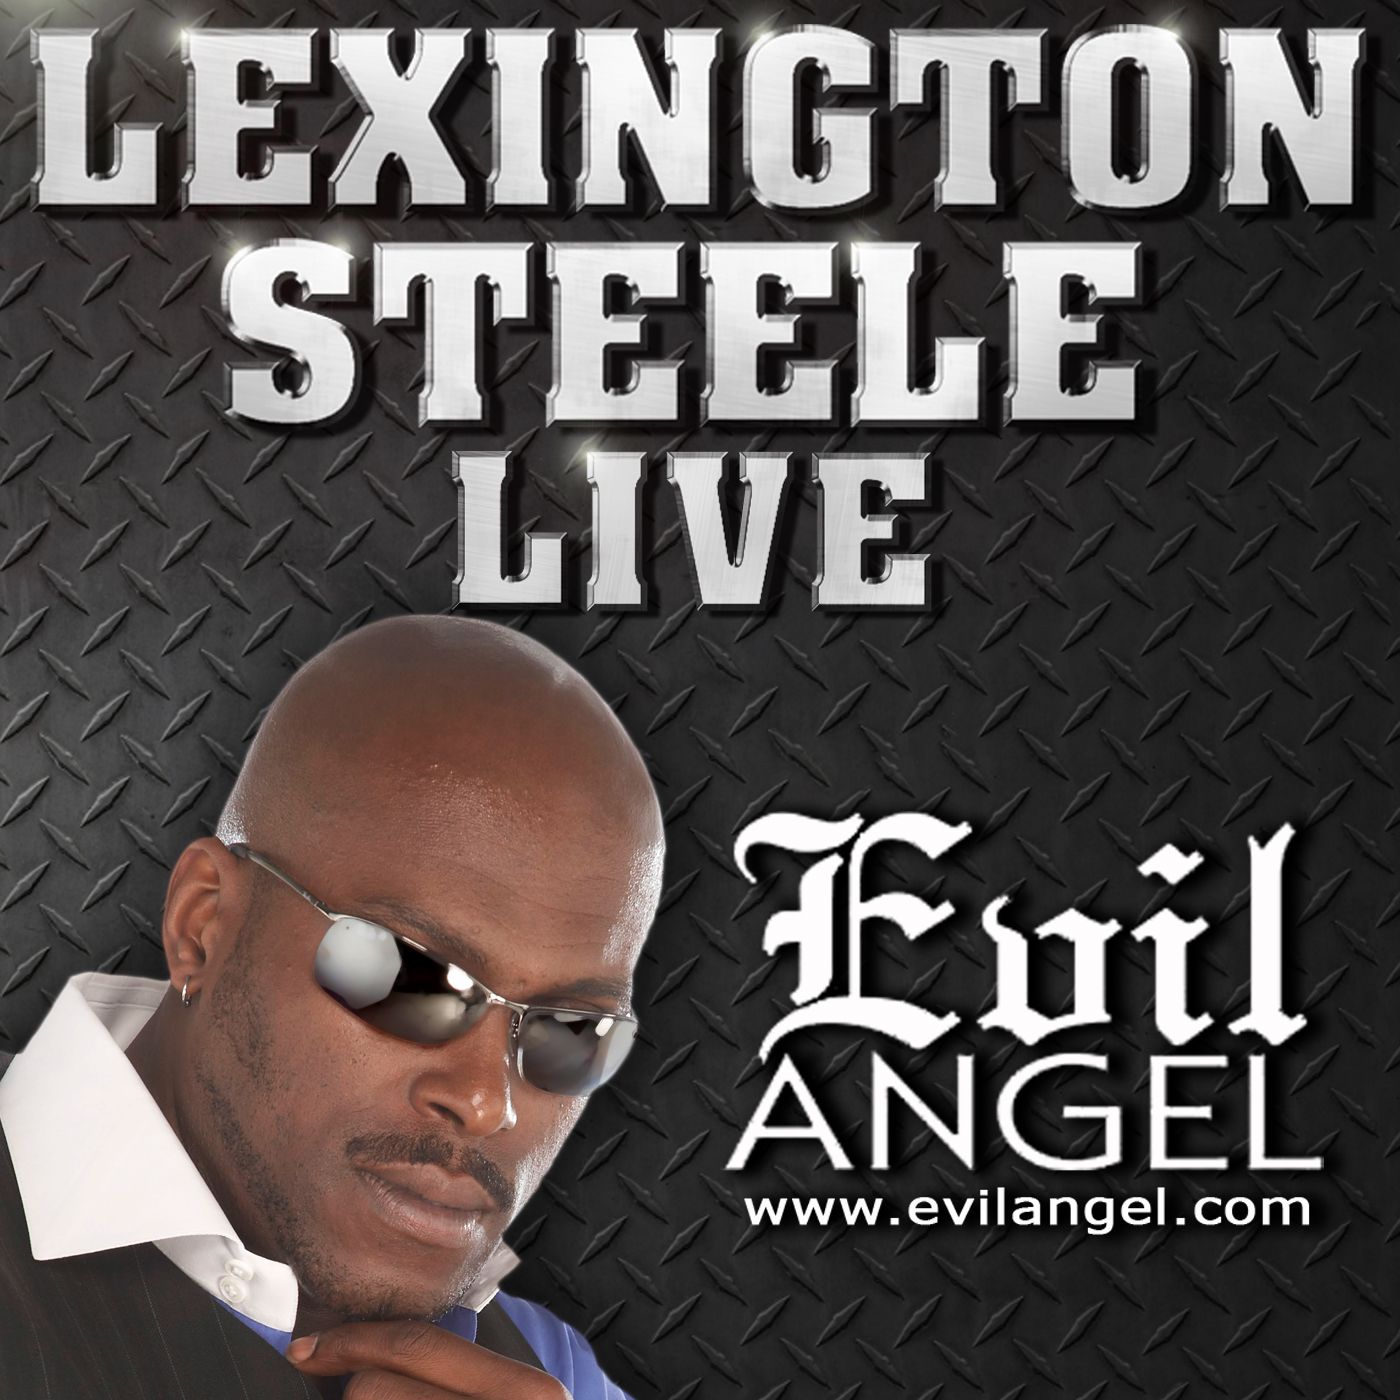 Lexington Steele Live Podcast